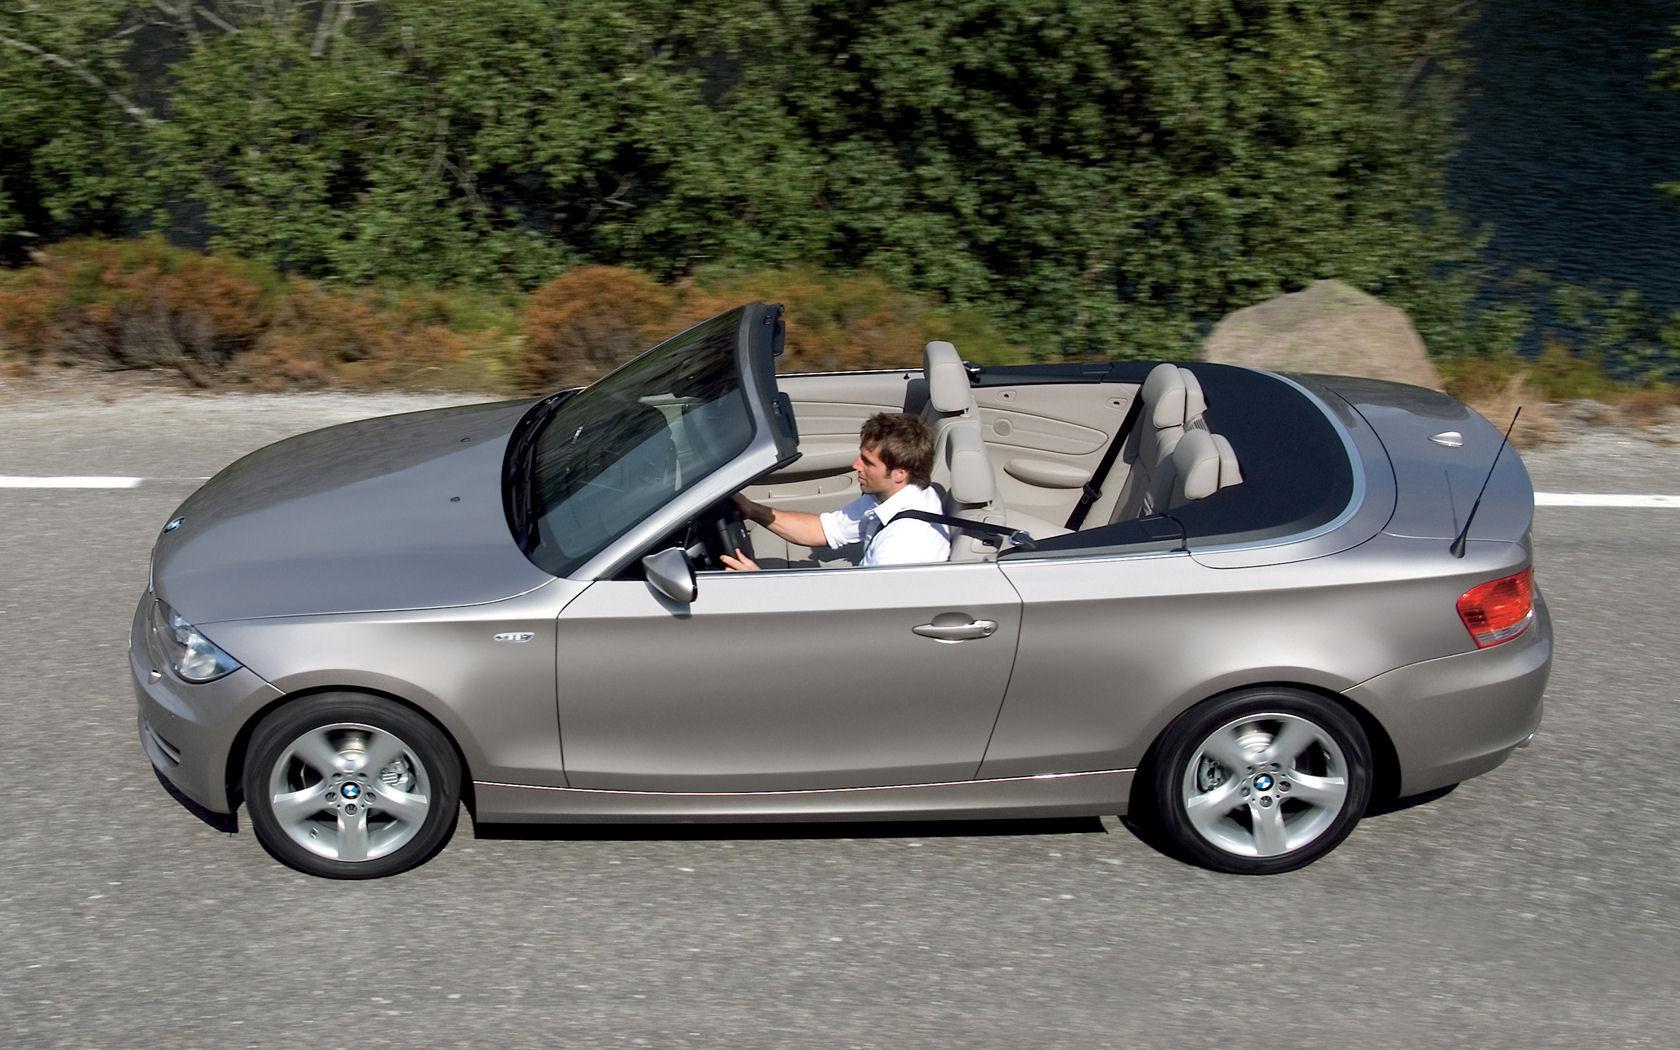 BMW 1-Series, 128i, 135i - Free Widescreen Wallpaper ...